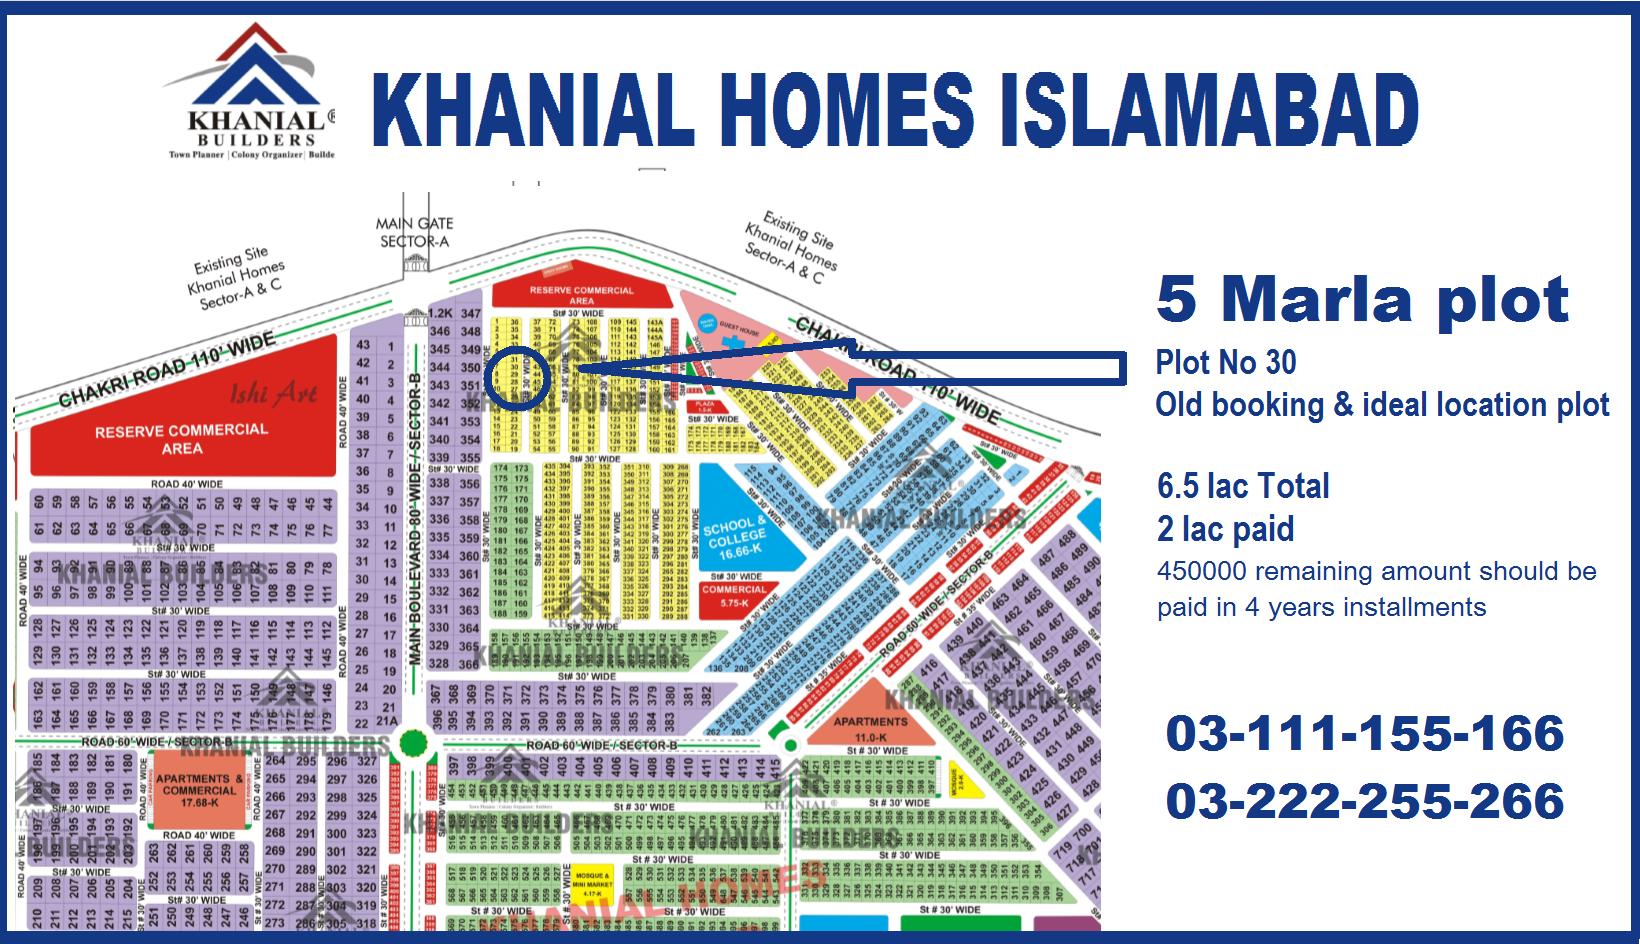 Khanial Homes 5 8 10 Marla Plot for sale by Alam Enterprises Islamabad